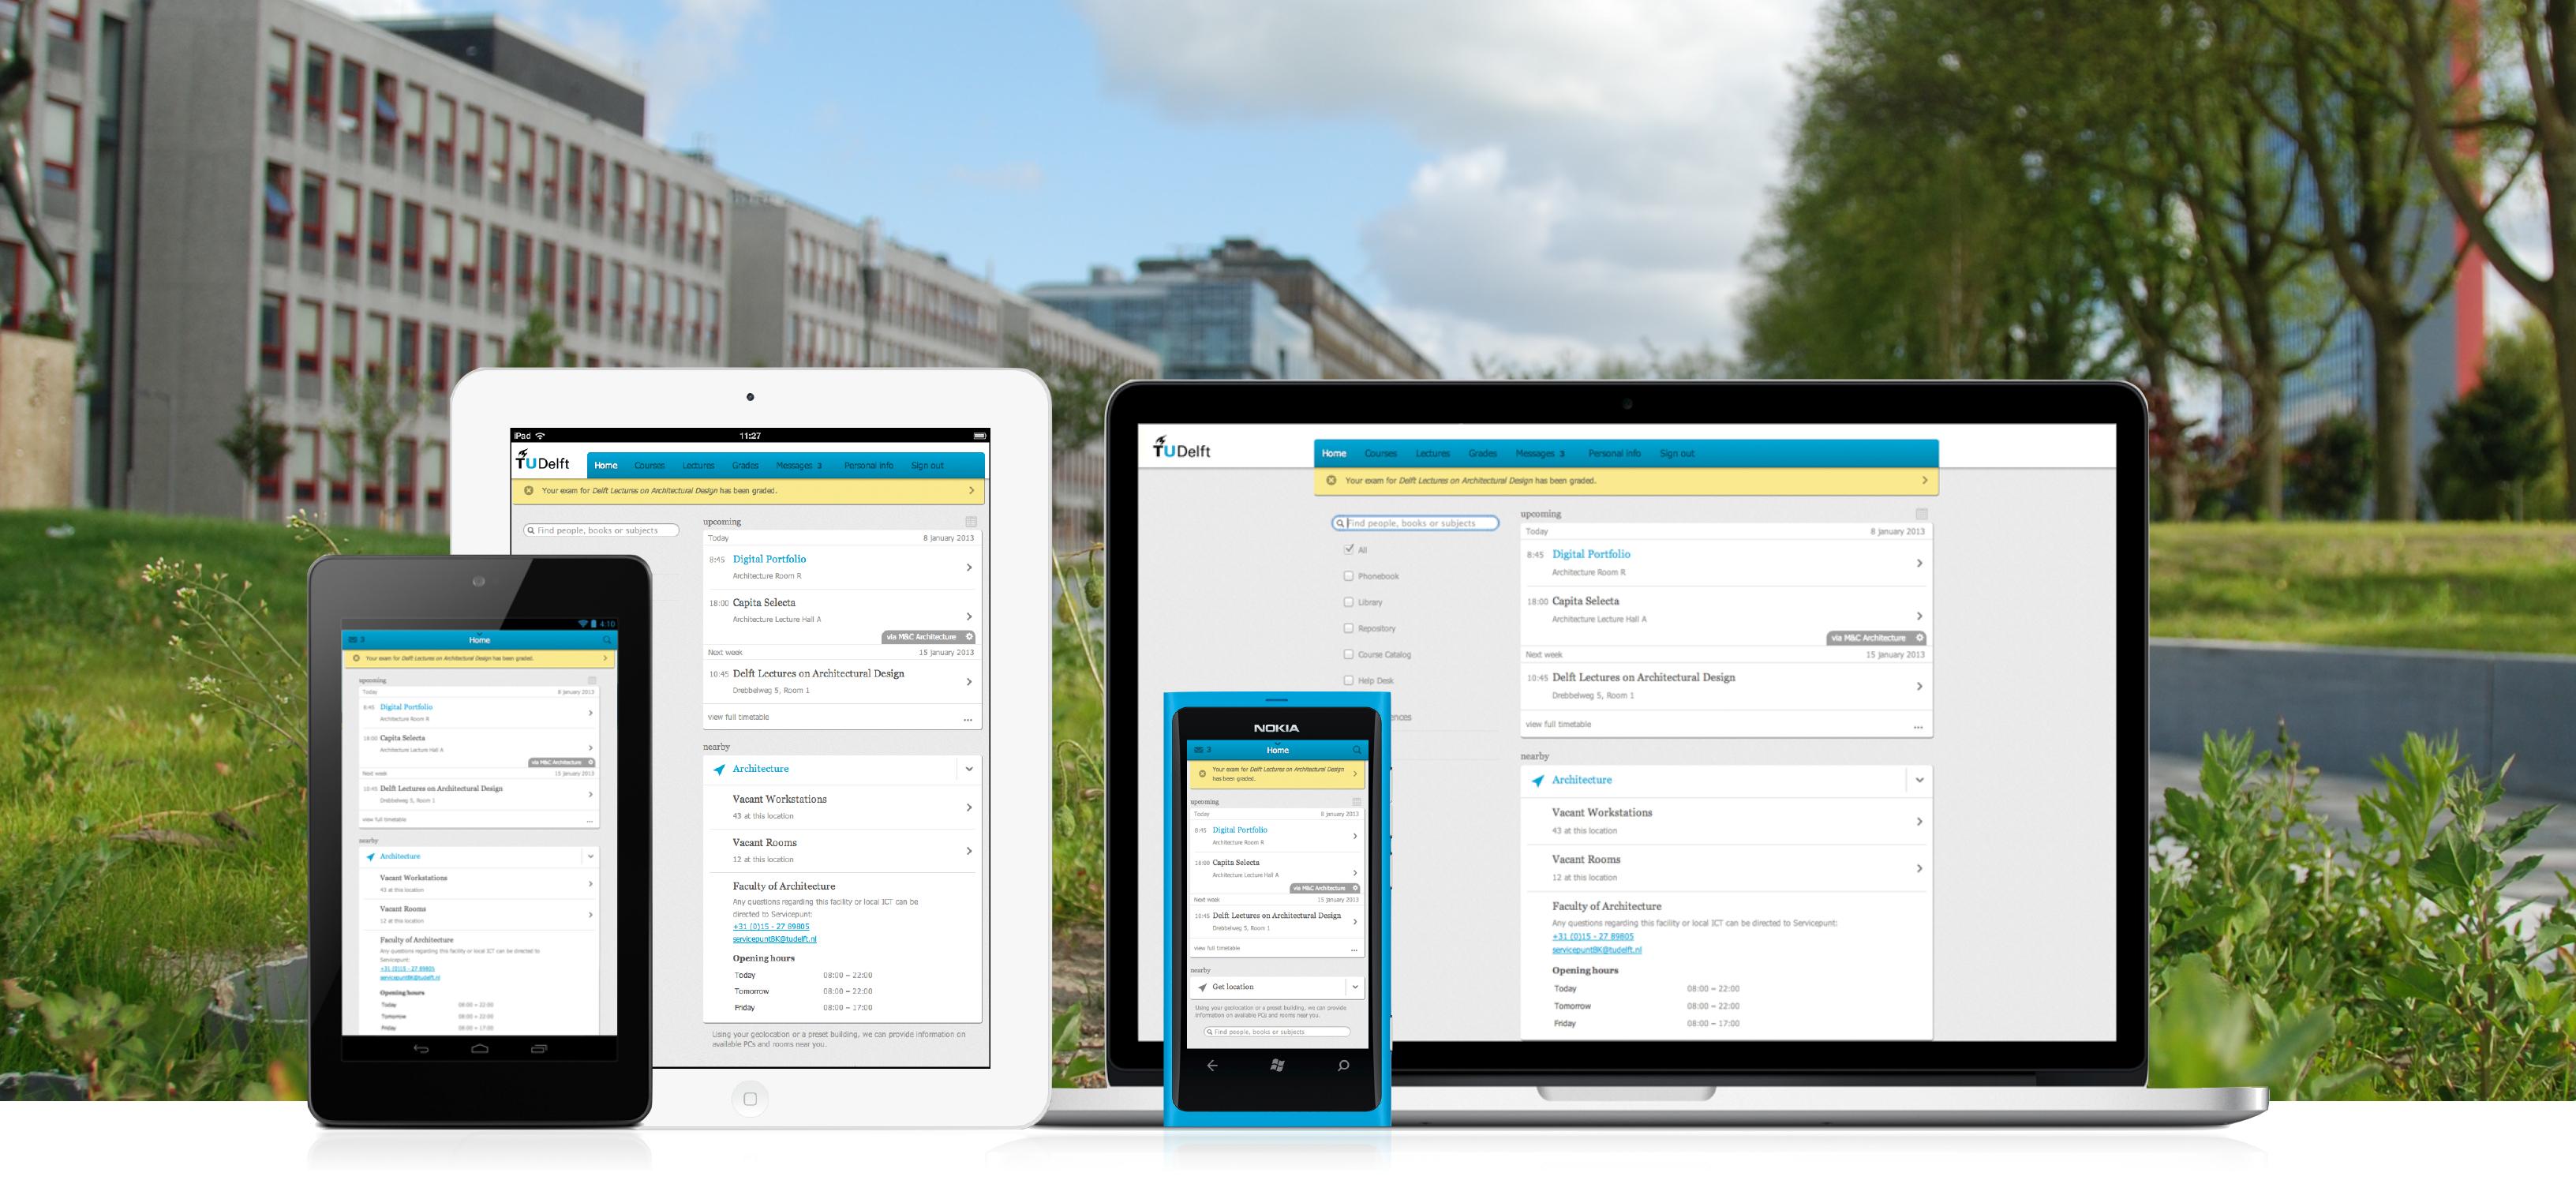 My Tu Delft - Roderick Trompert - Medium regarding Tu Delft Time Table Boukunde 2020